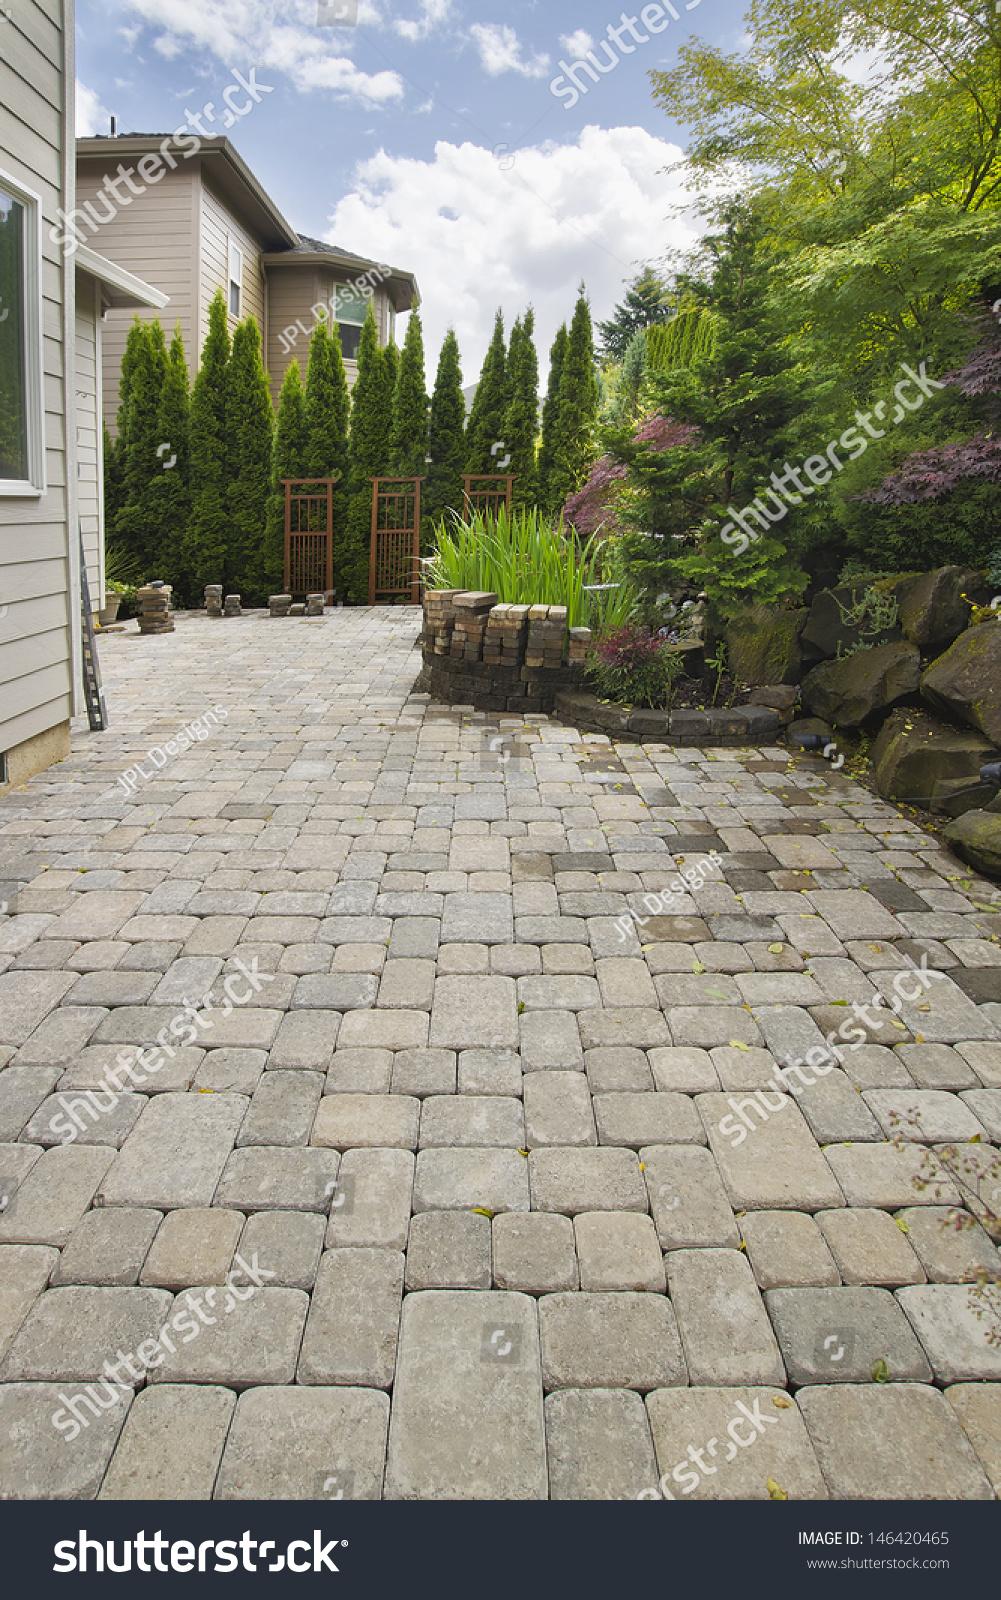 garden backyard hardscape brick pavers patio stock photo 146420465